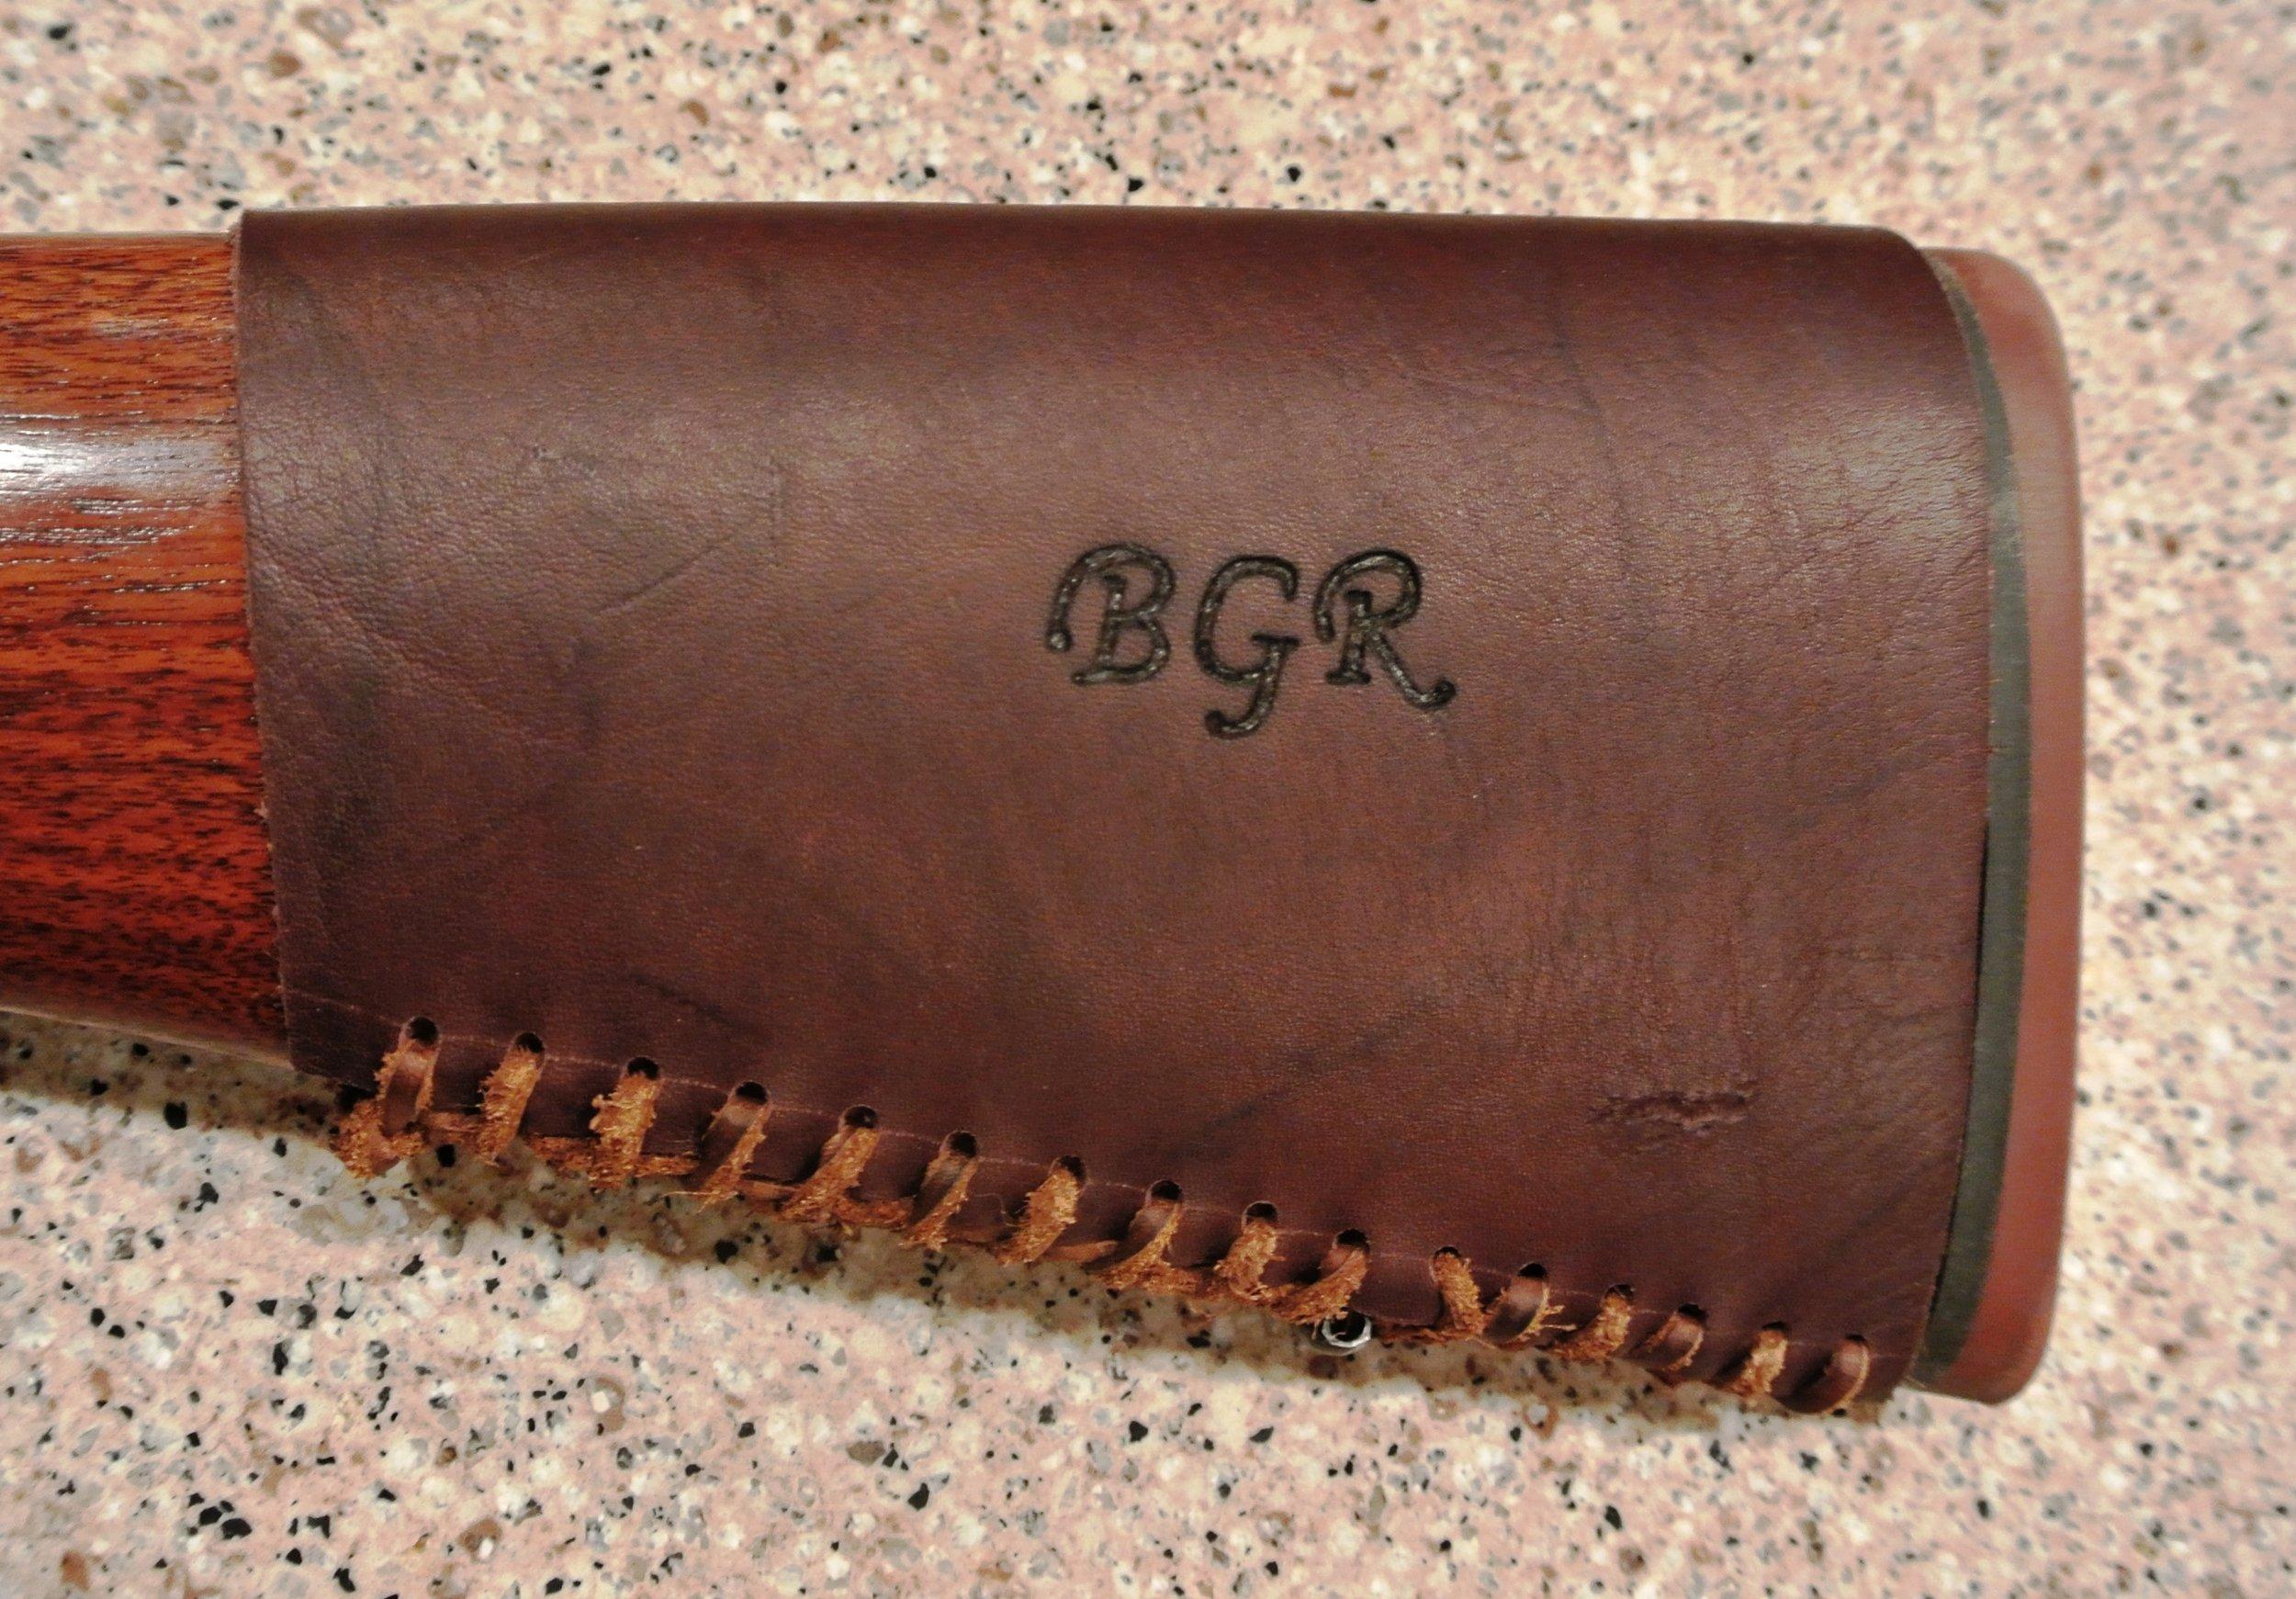 Circle M Brand - (Buttstock Cuff) heat engraving initials BGR.JPG